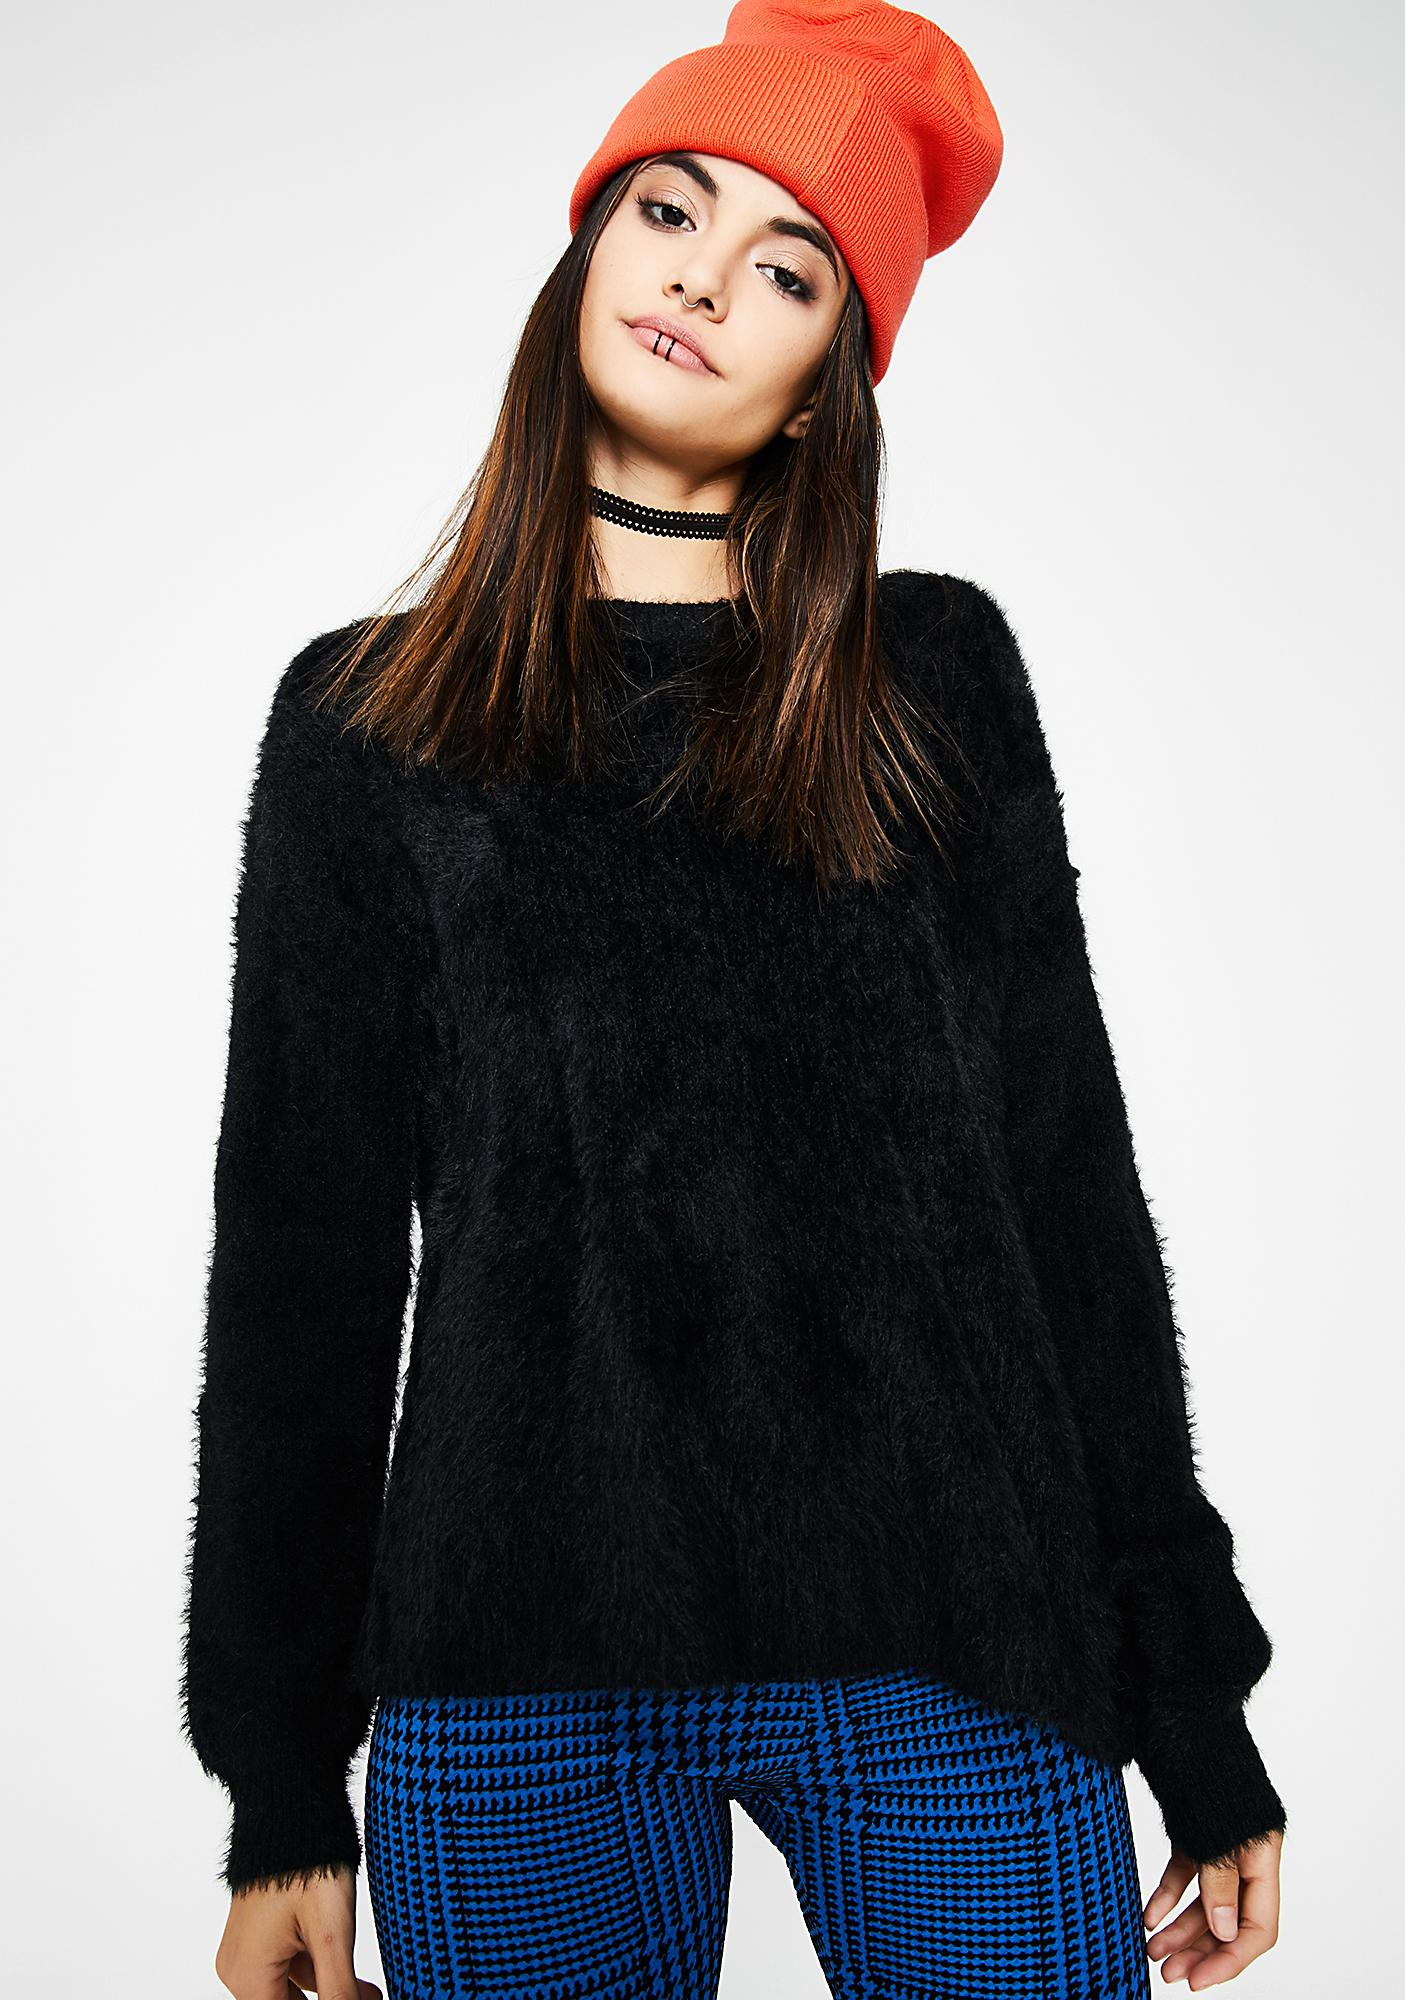 Get Fuzz'd Tie Back Sweater